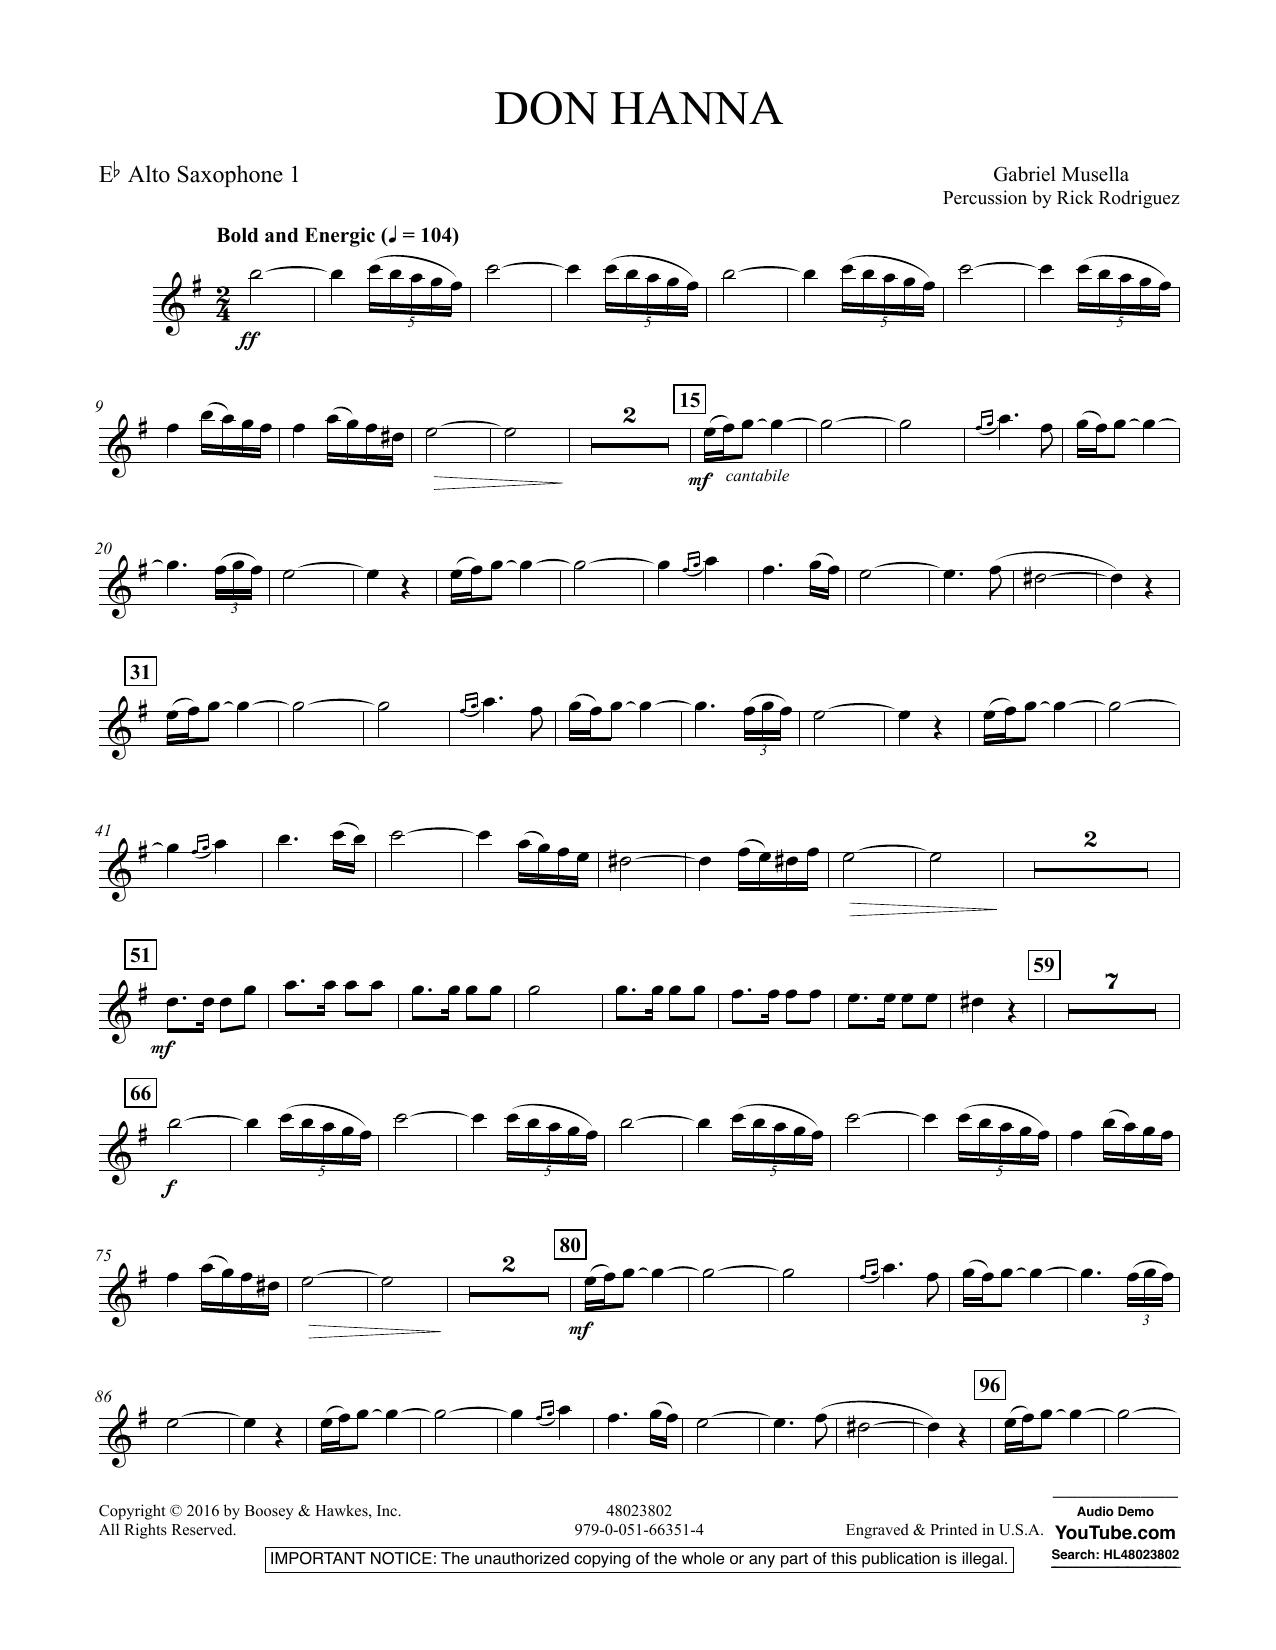 Don Hanna - Eb Alto Saxophone 1